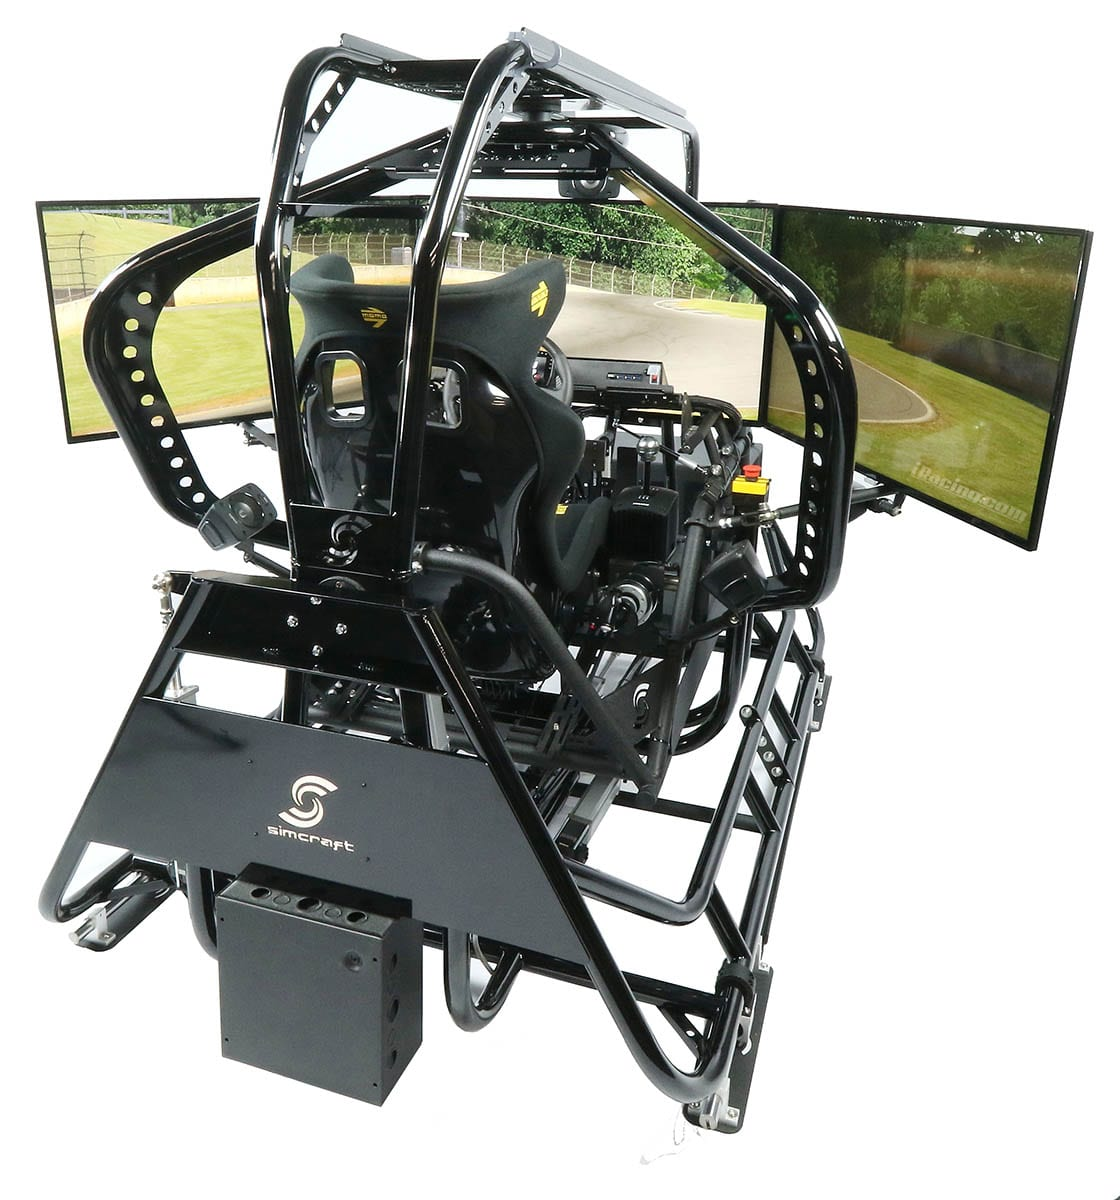 SimCraft APEX4 4DOF Professional Motion Racing Simulator_hero2.JPG